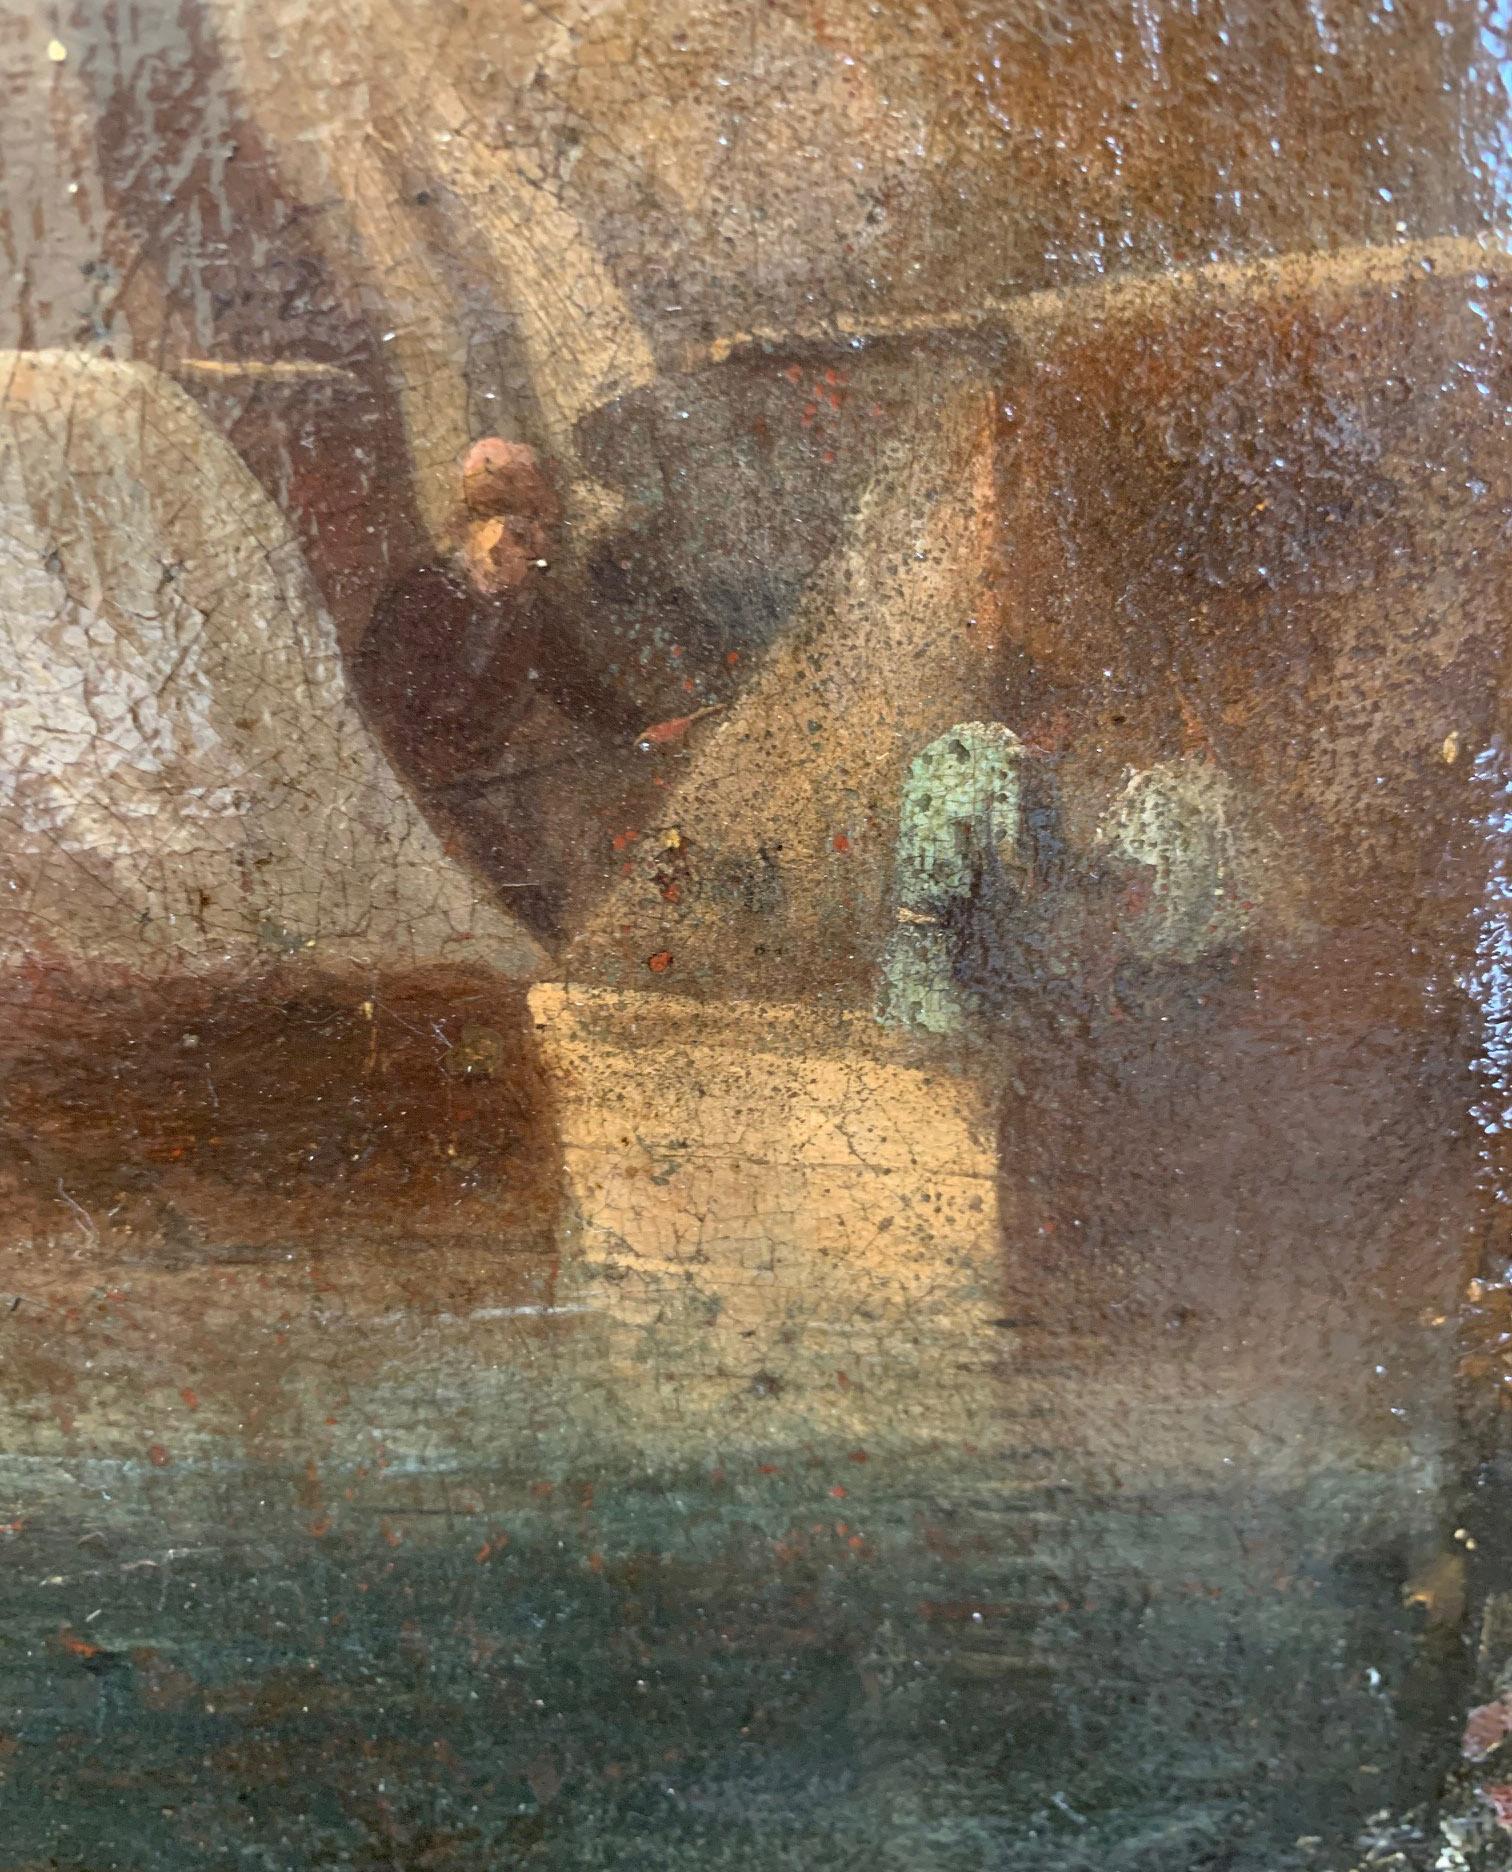 CIRCLE OF JAN VAN GOYEN, LEIDEN, 1596 - 1656, THE HAGUE, 17TH CENTURY OIL ON CANVAS River landscape, - Image 11 of 12